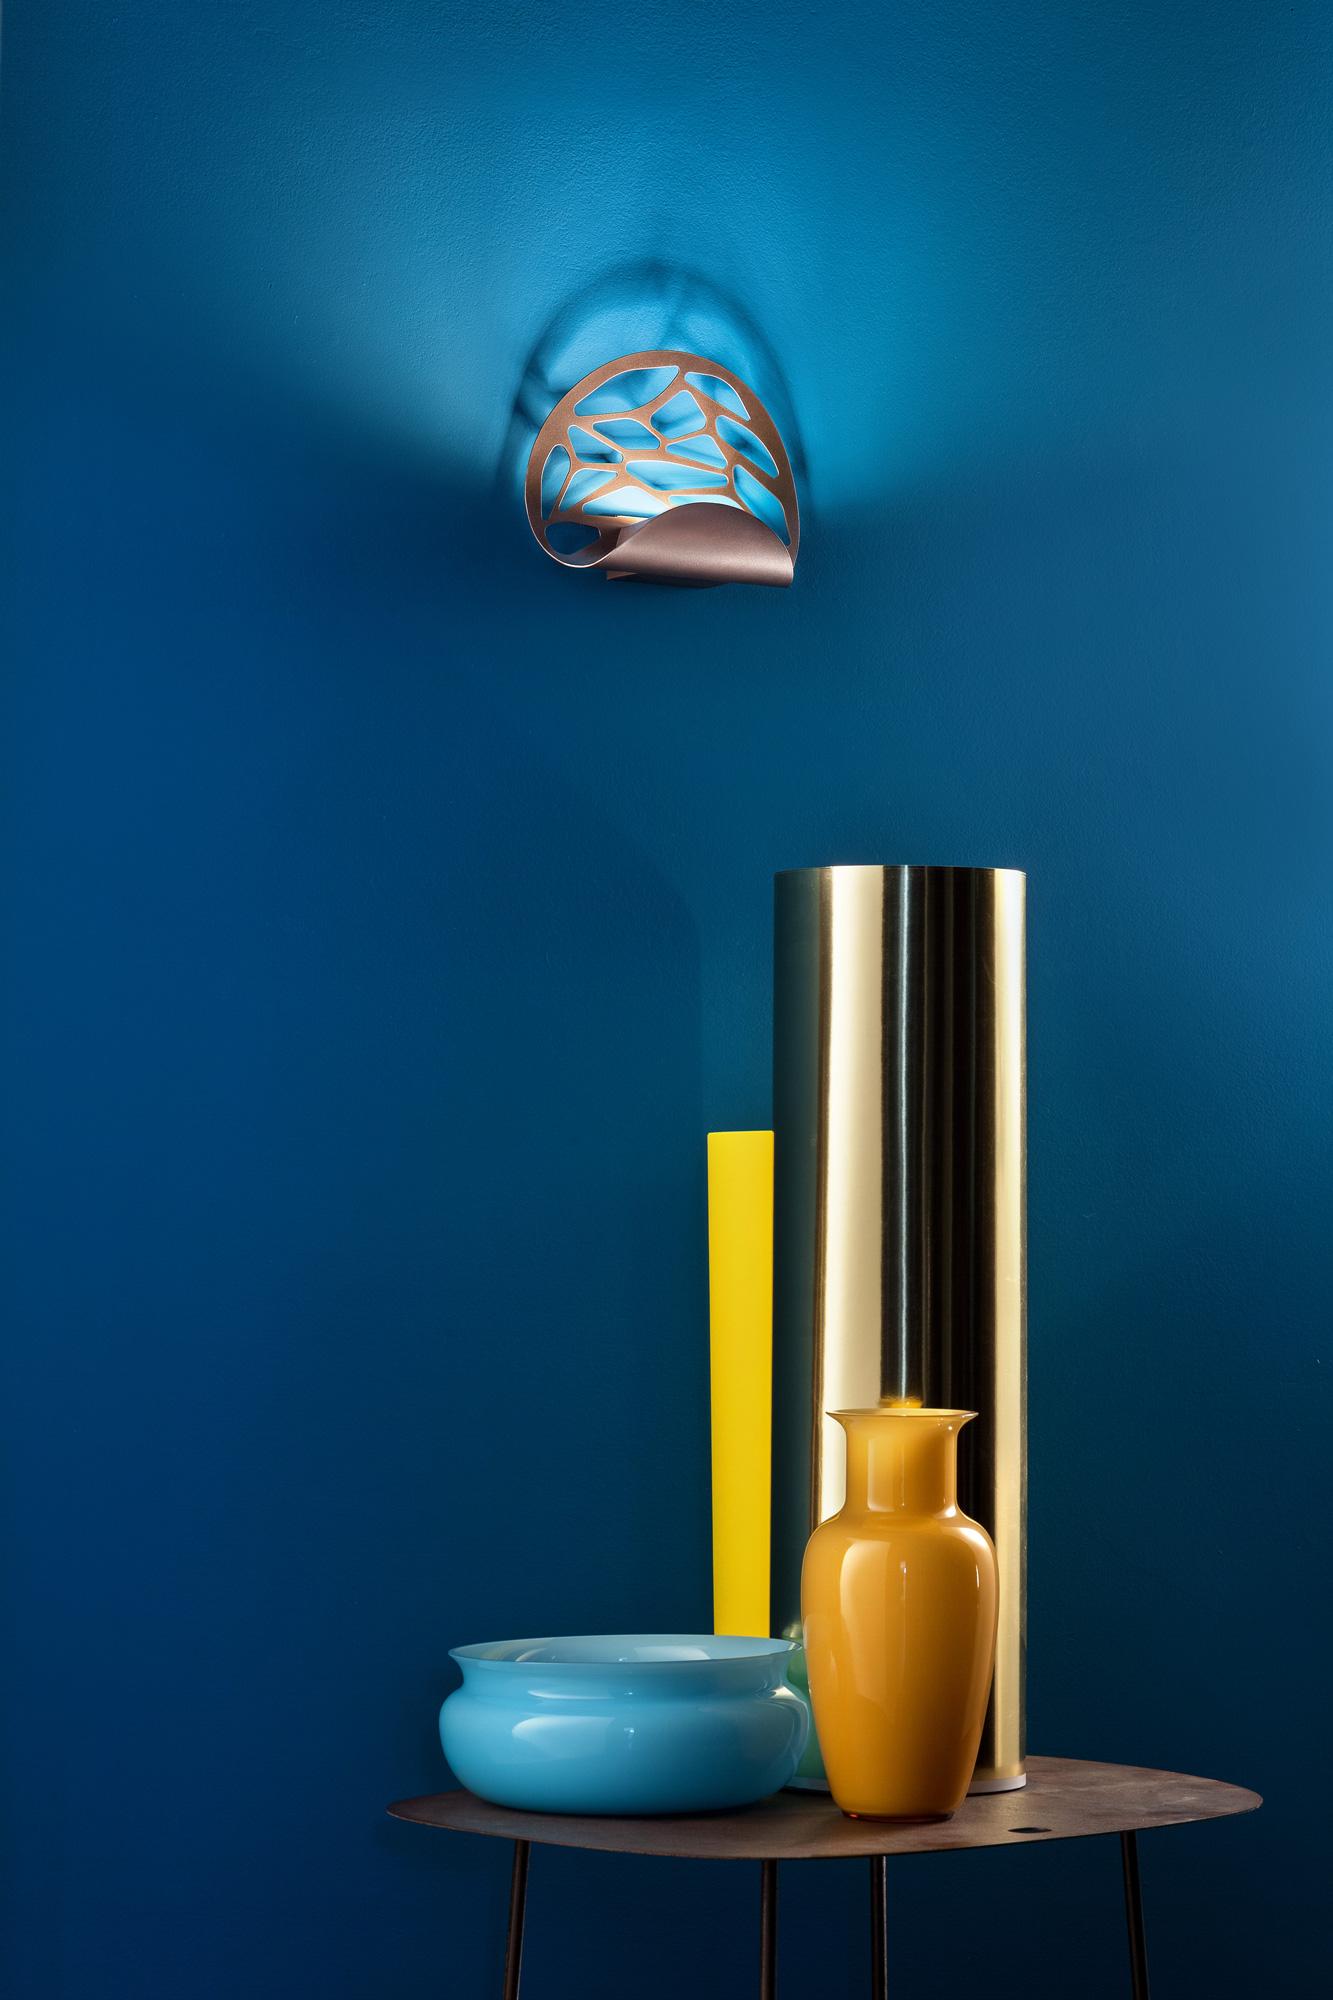 Modern High-End Italian Designer Kelly Wall Lamp - Designer & Luxury Lighting at Cassoni